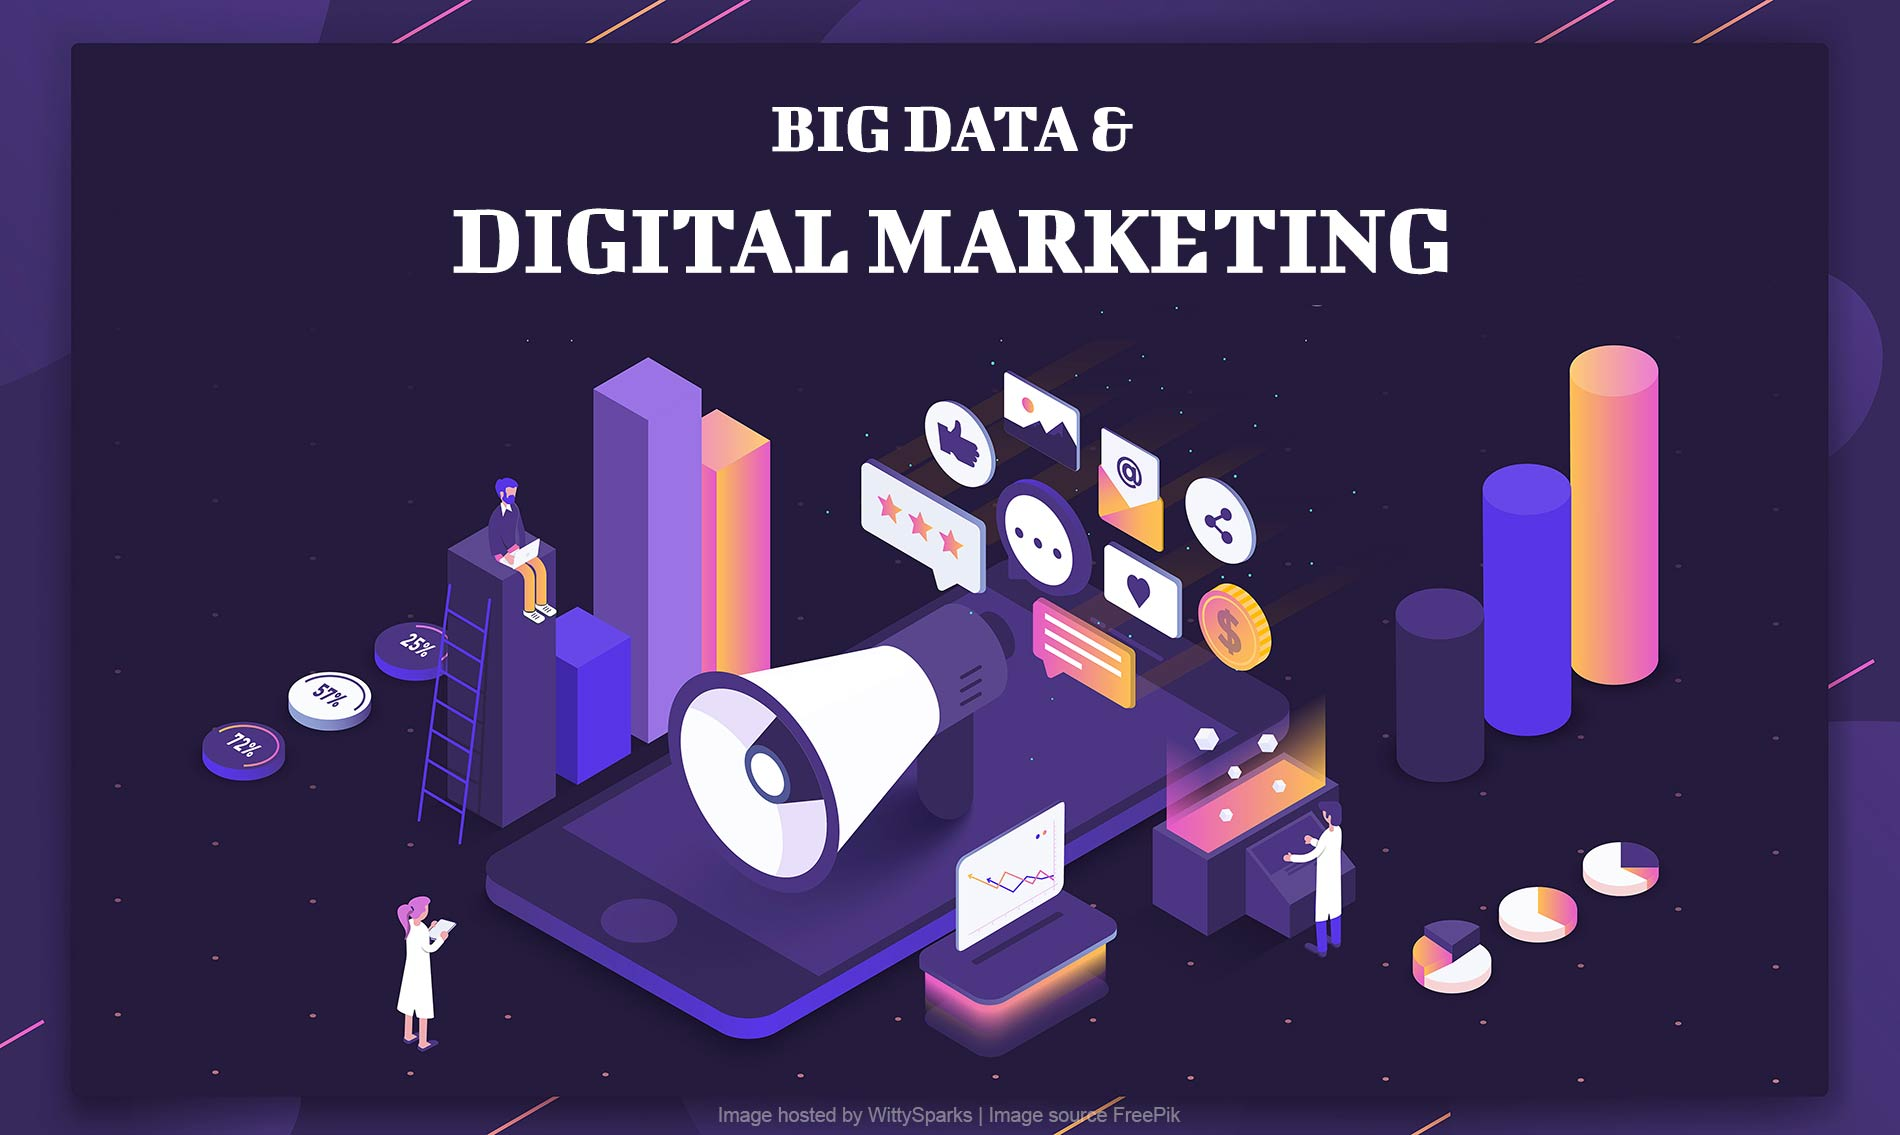 Benefits of using Big Data for Digital Marketing